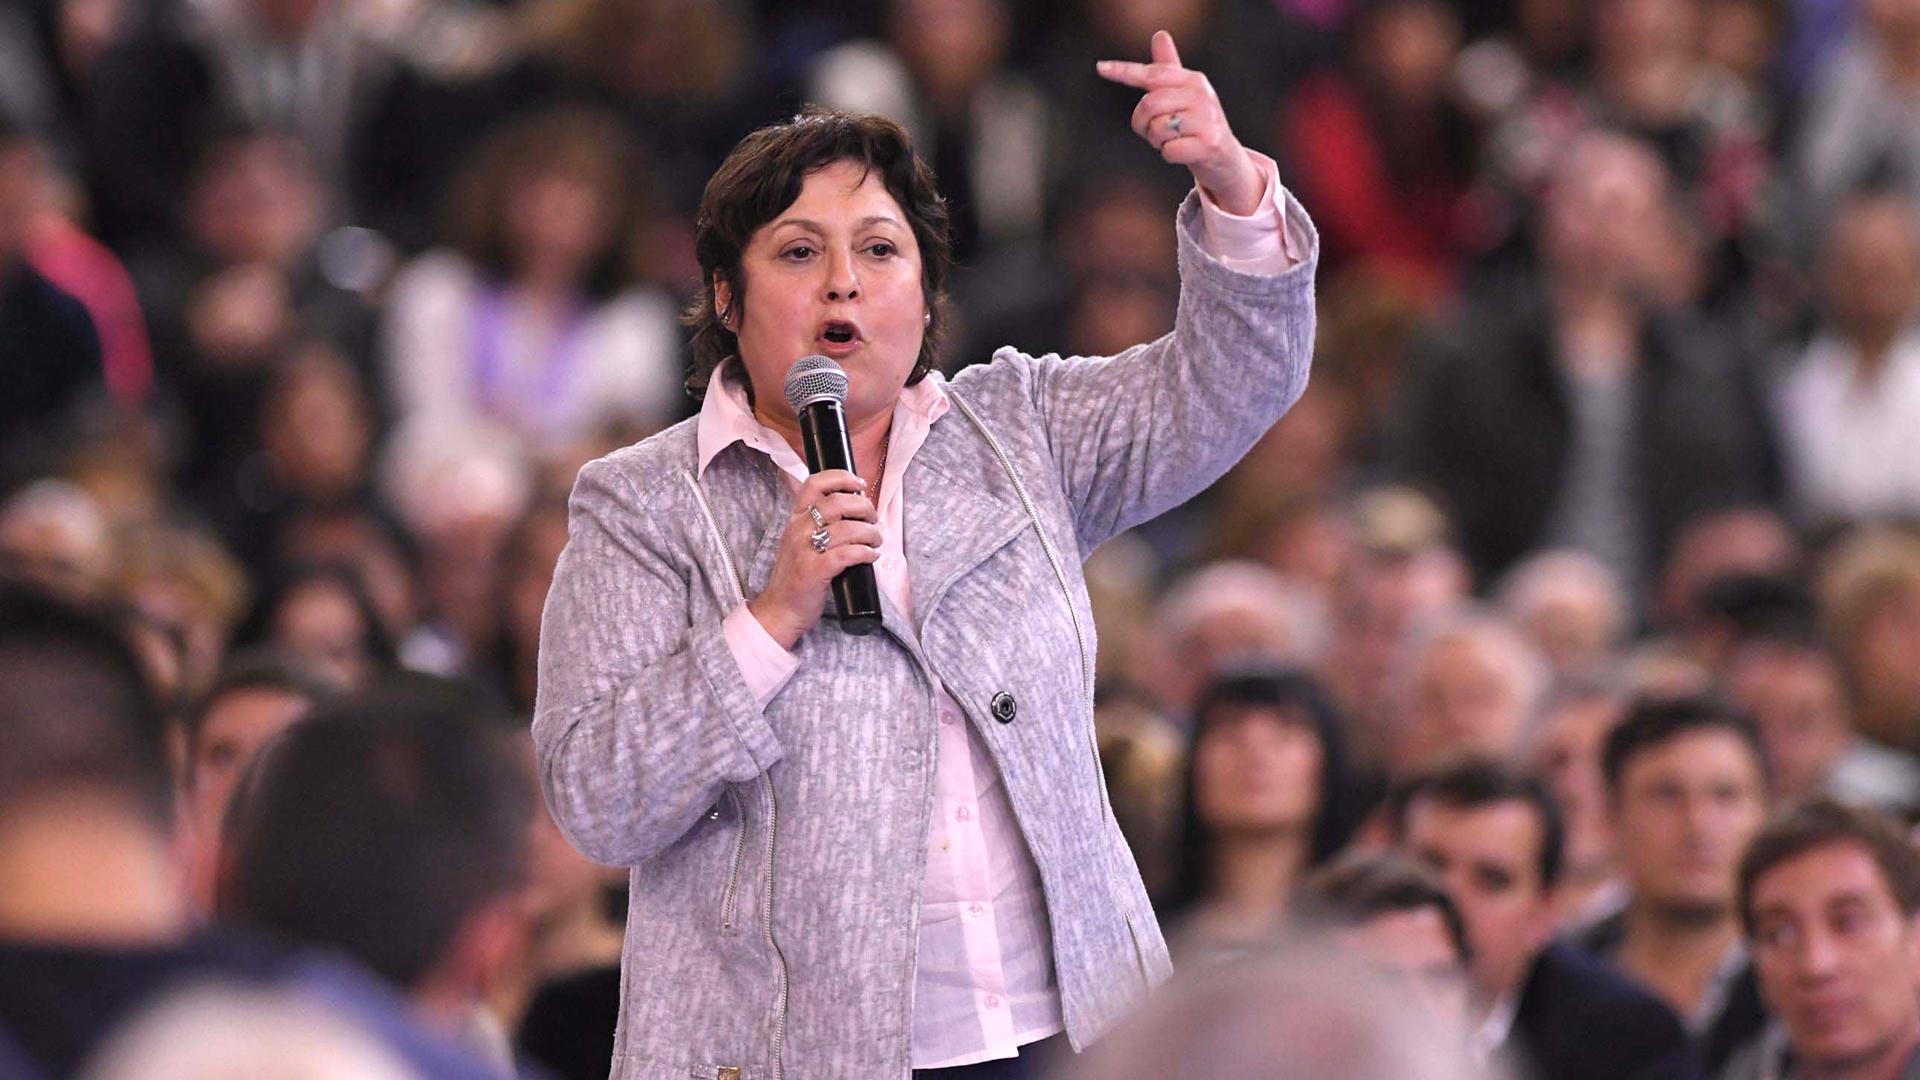 La diputada nacional Graciela Ocaña (Télam)